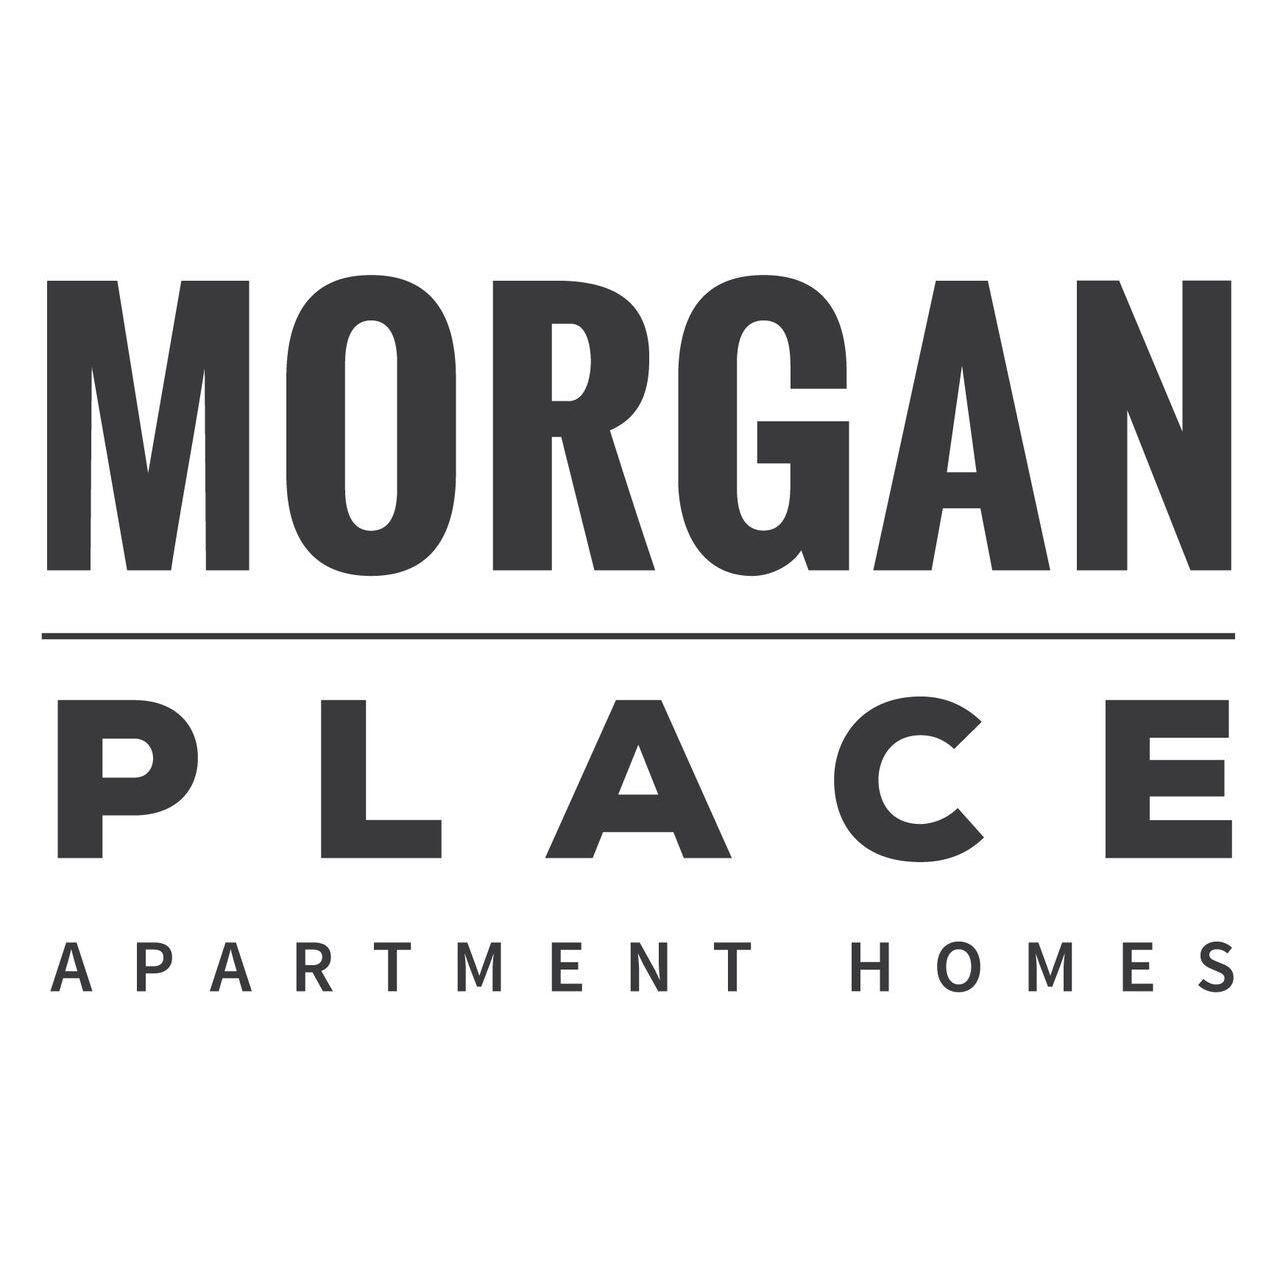 Morgan Place Apartment Homes